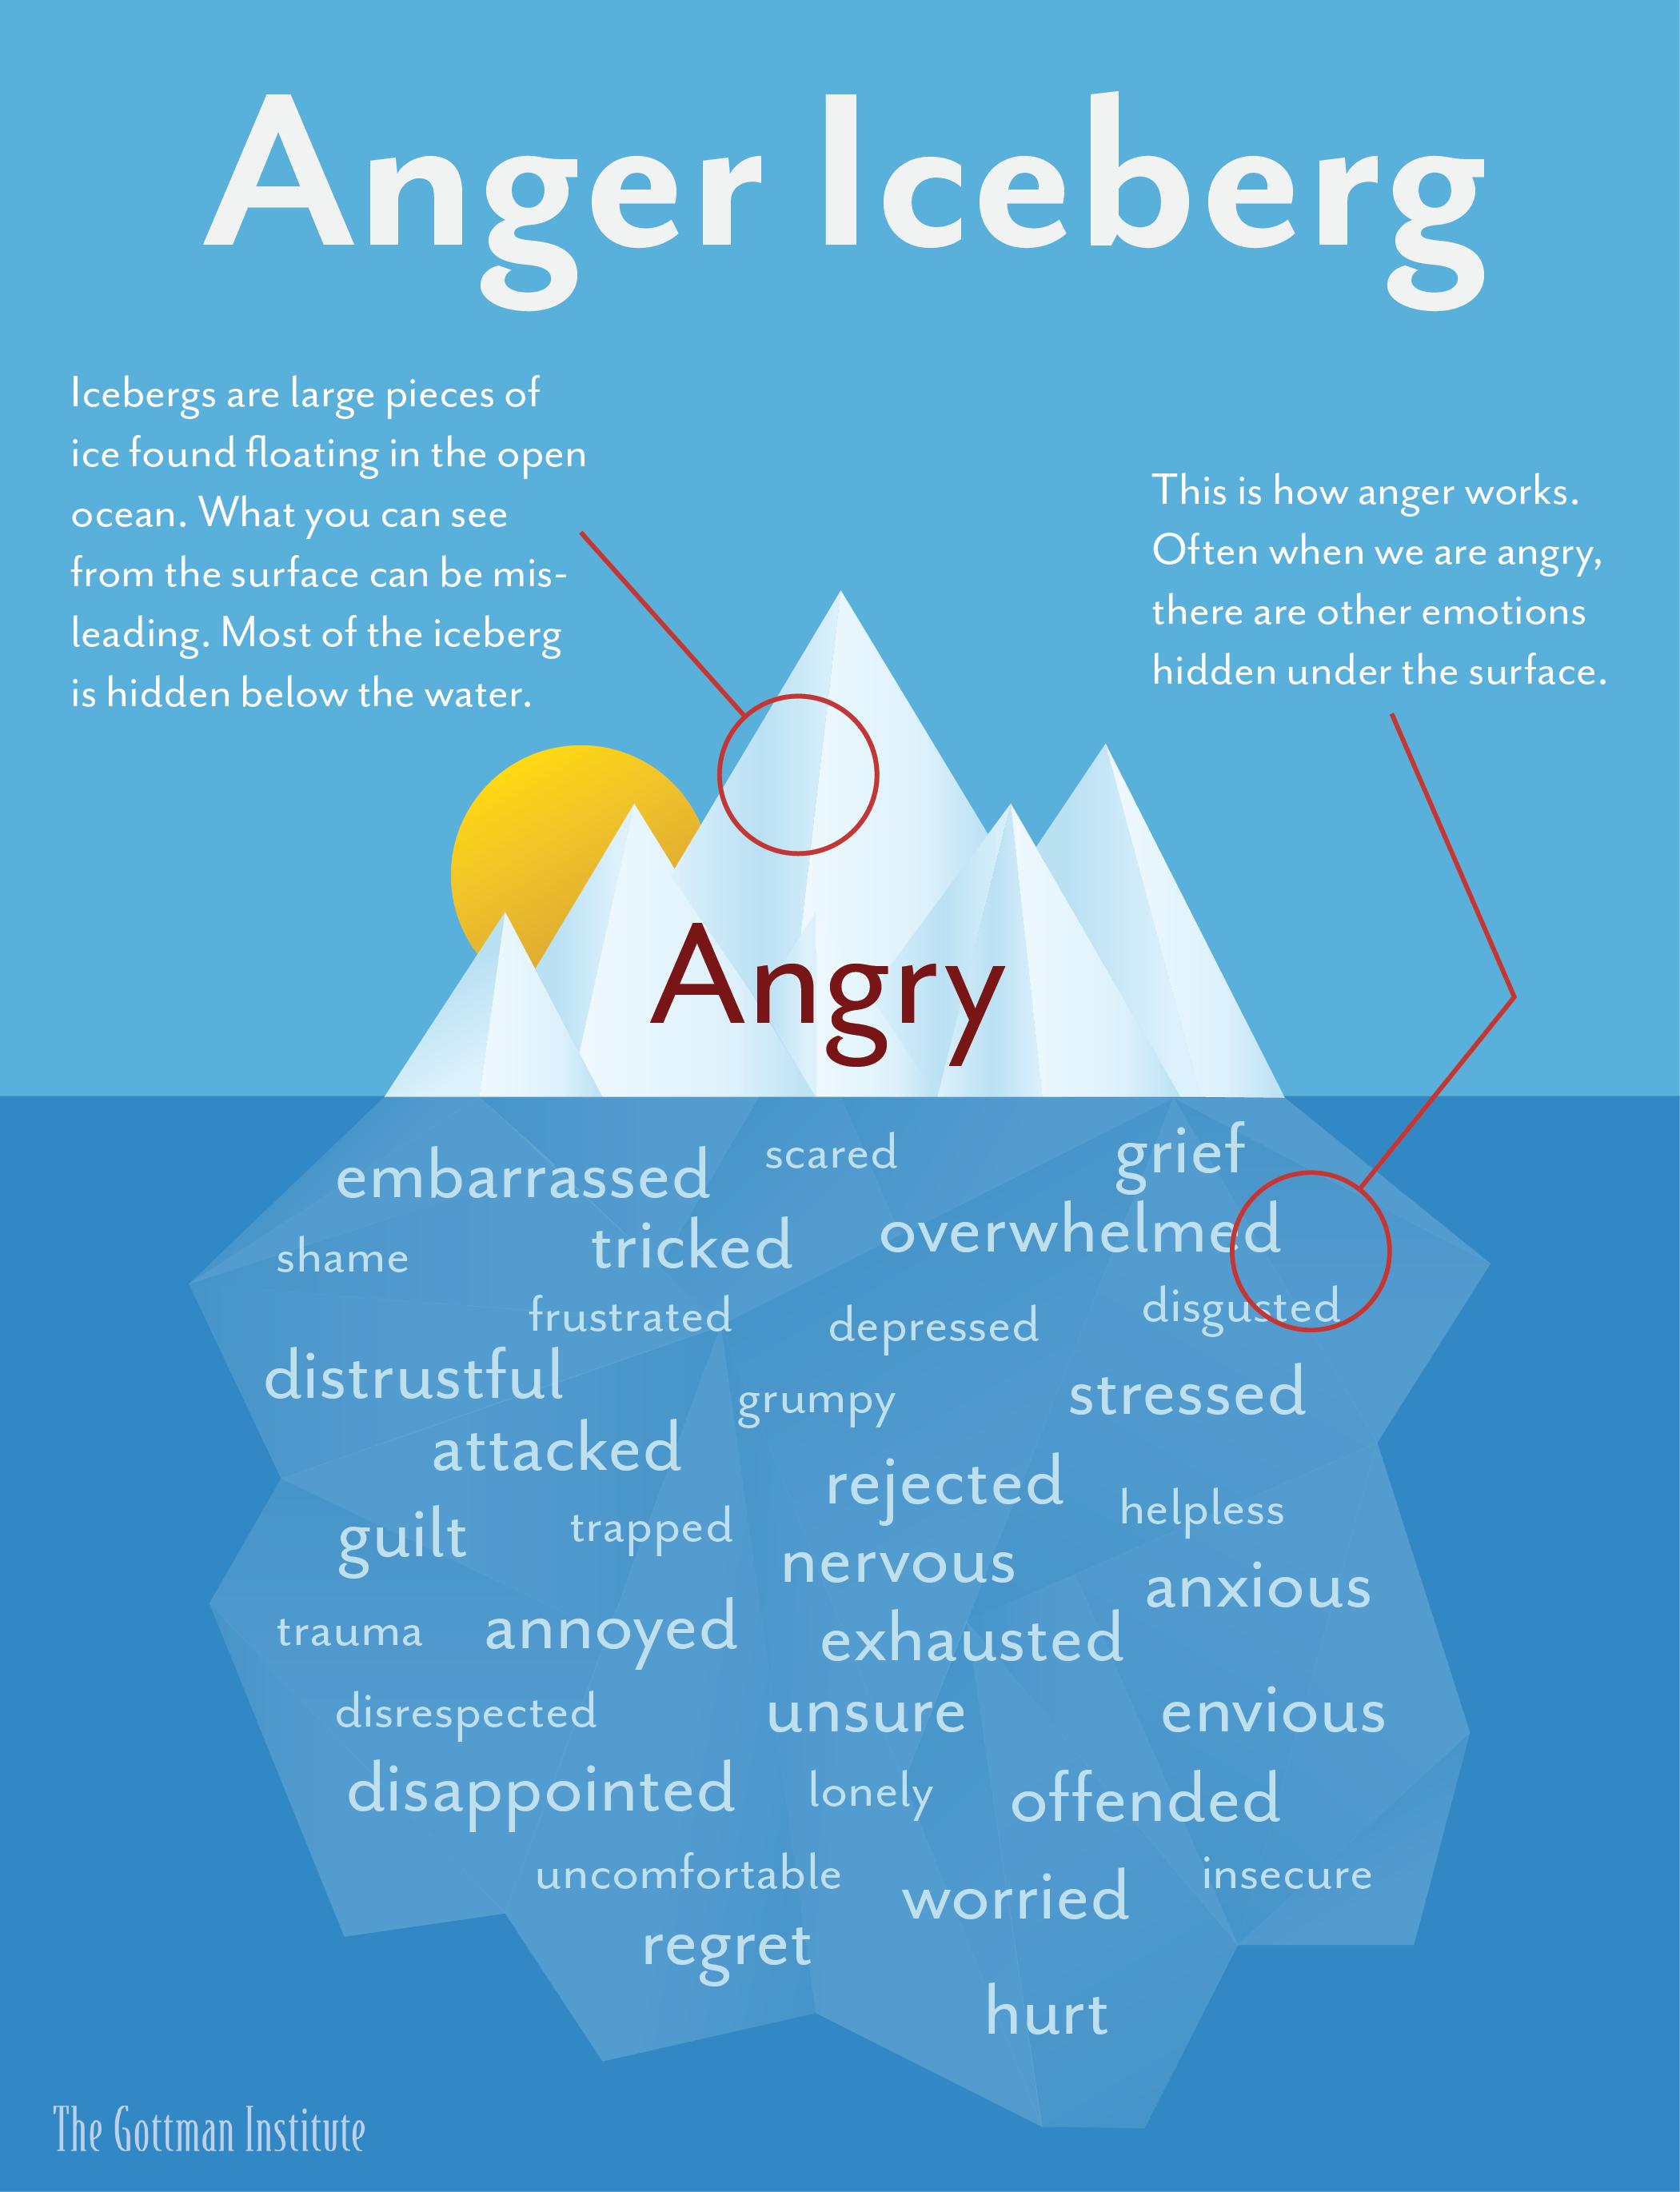 Anger-Iceberg-1.png